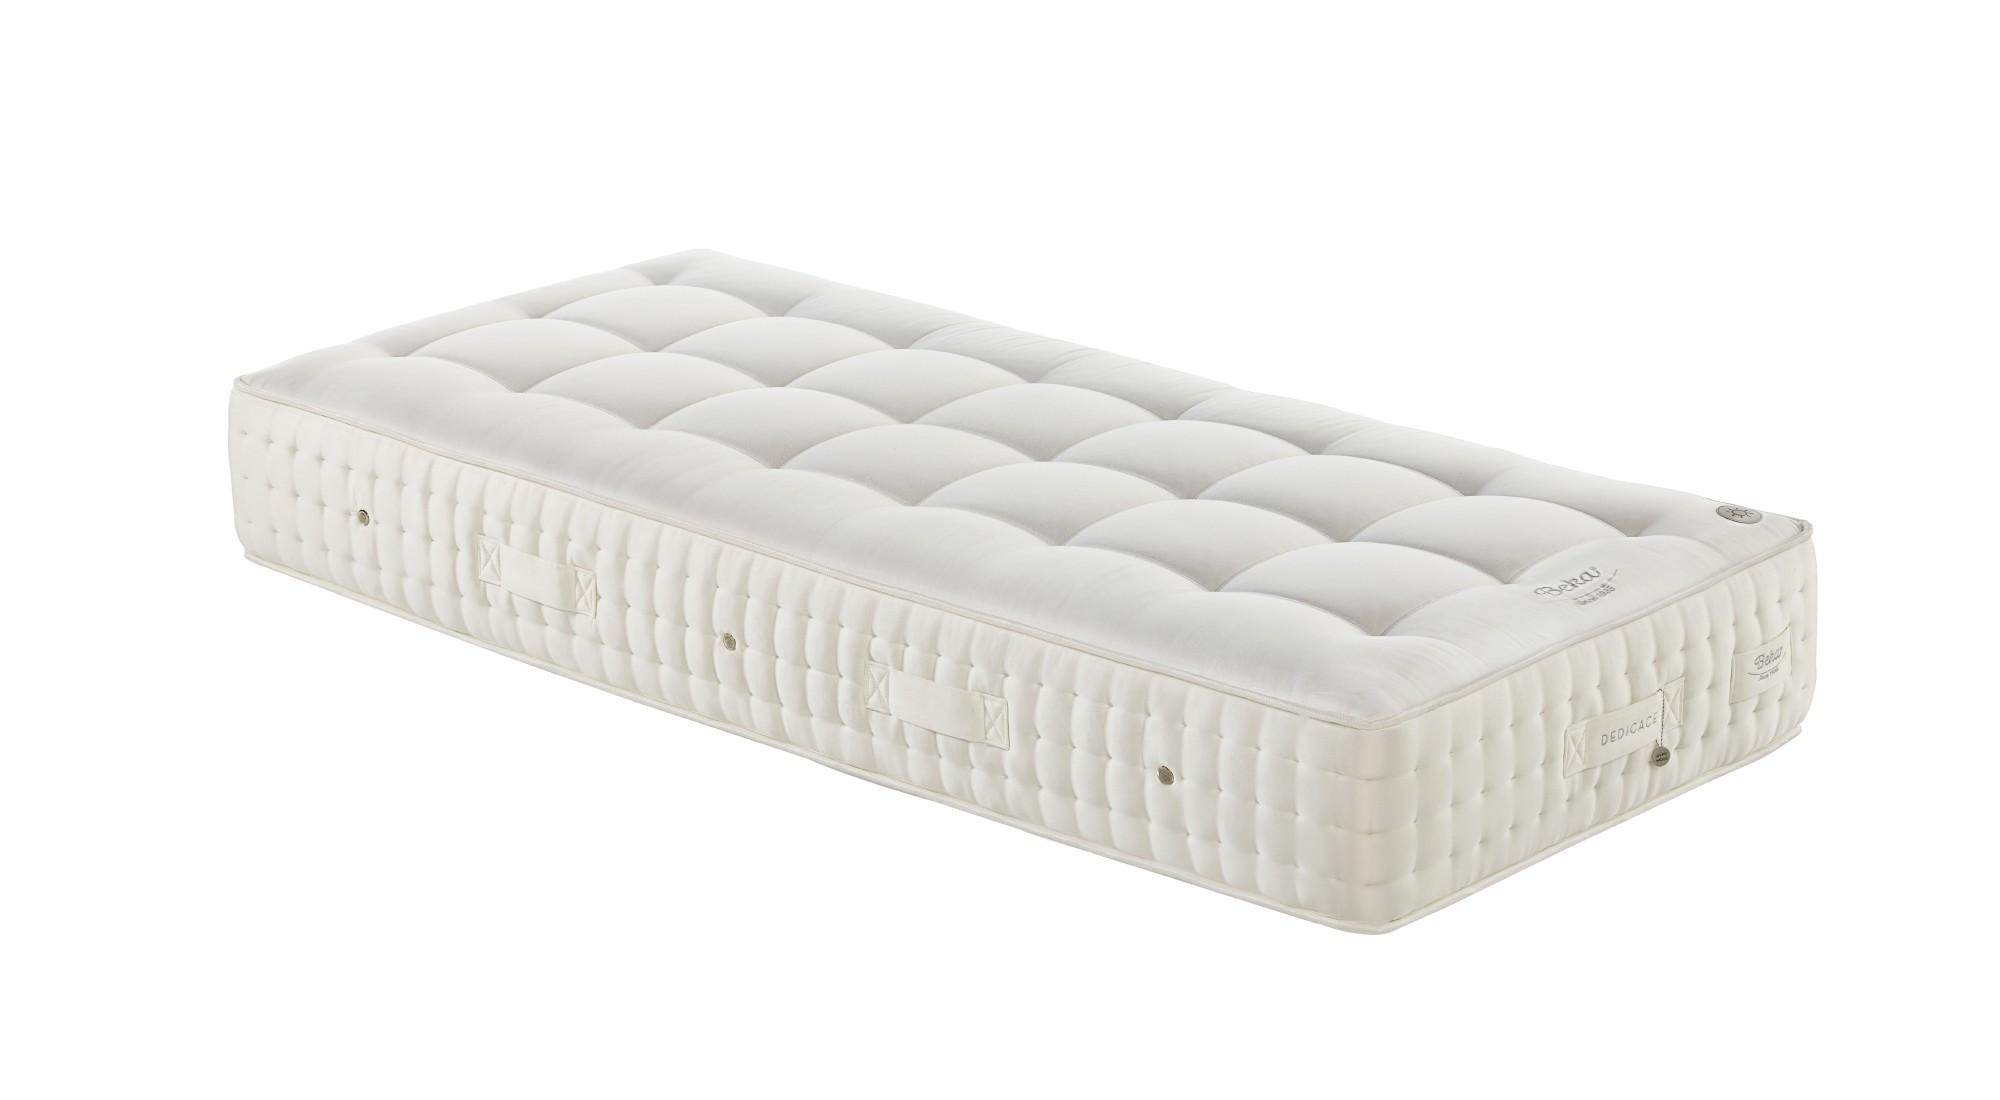 matelas beka capitonn la main r versible face t s ou hiver. Black Bedroom Furniture Sets. Home Design Ideas